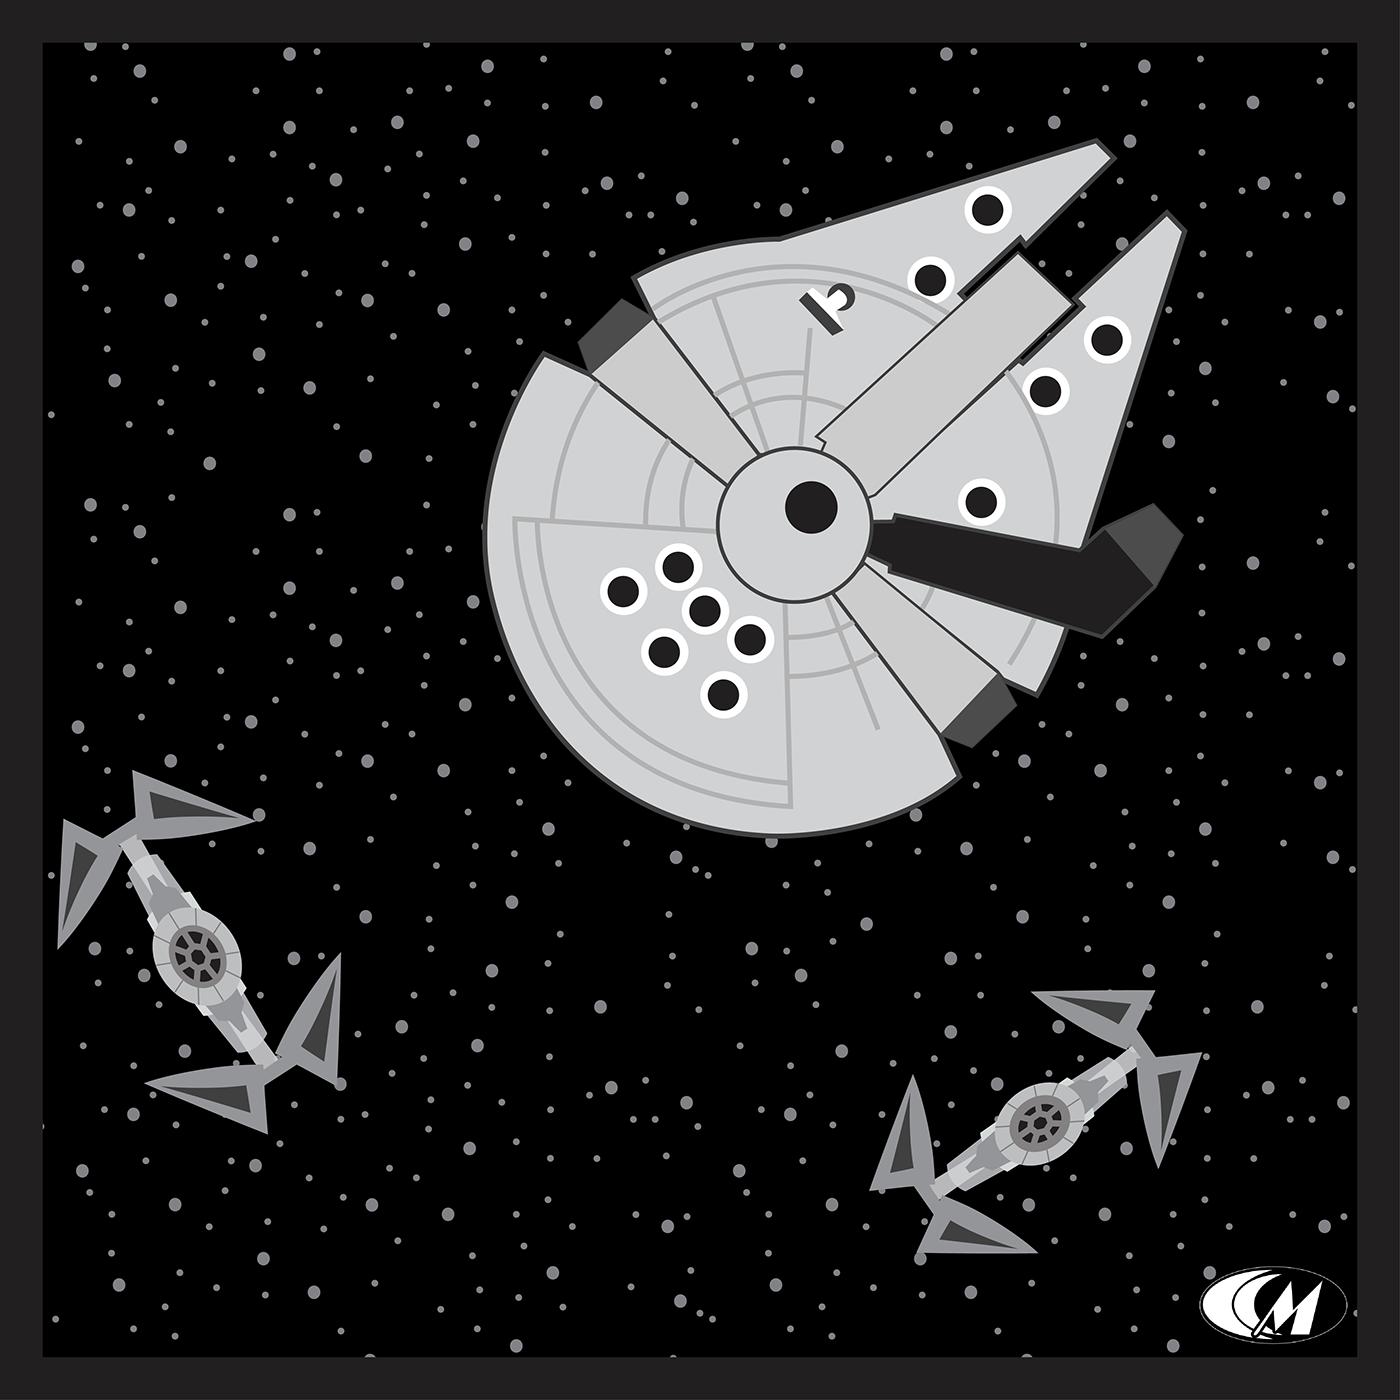 minimalist vector Space  star wars Princess Leia series